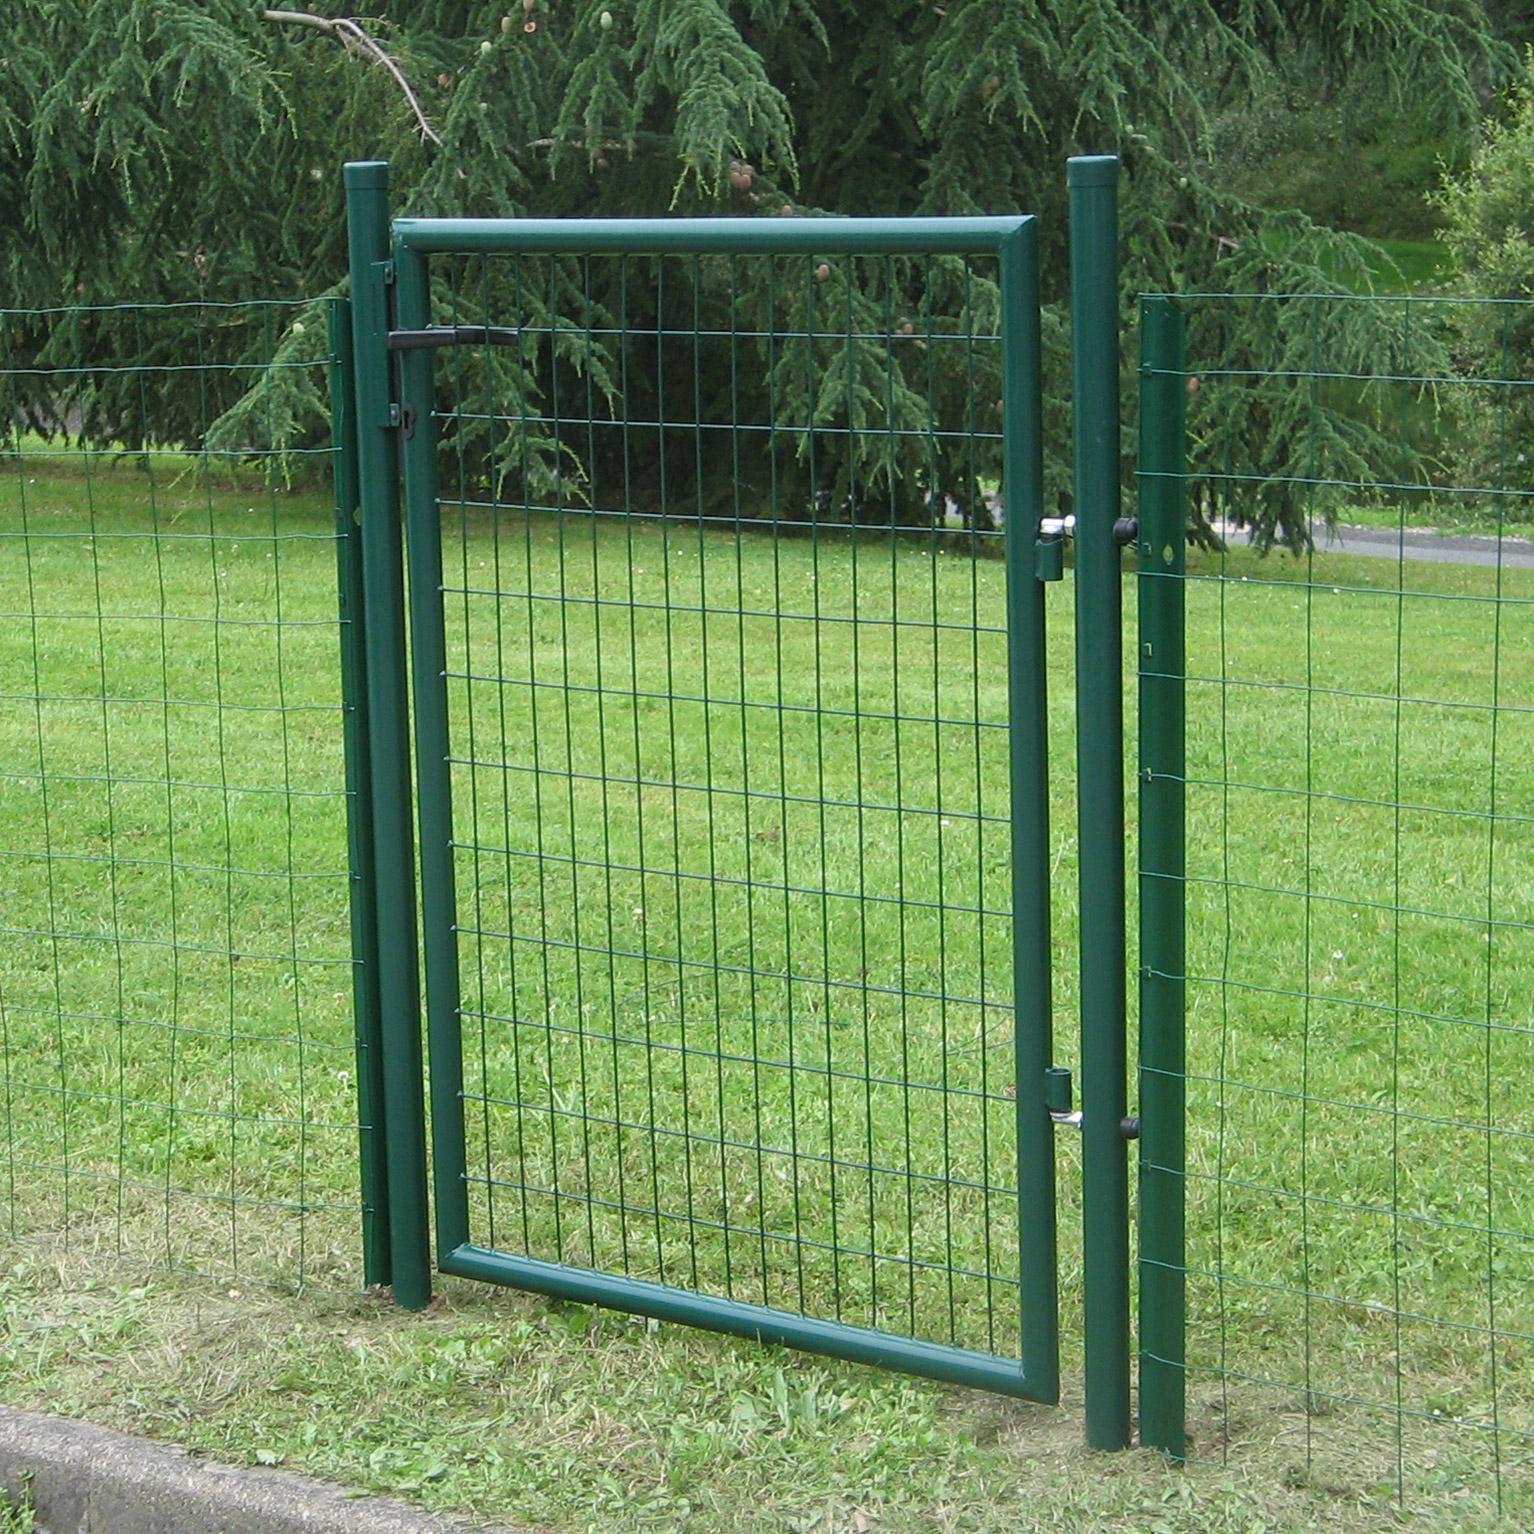 Portillon Grillage Eco Garden L 105 X H 175 Cm Vert Dirickx En 2020 Portillon Grillage Portillon Jardin Et Portillon